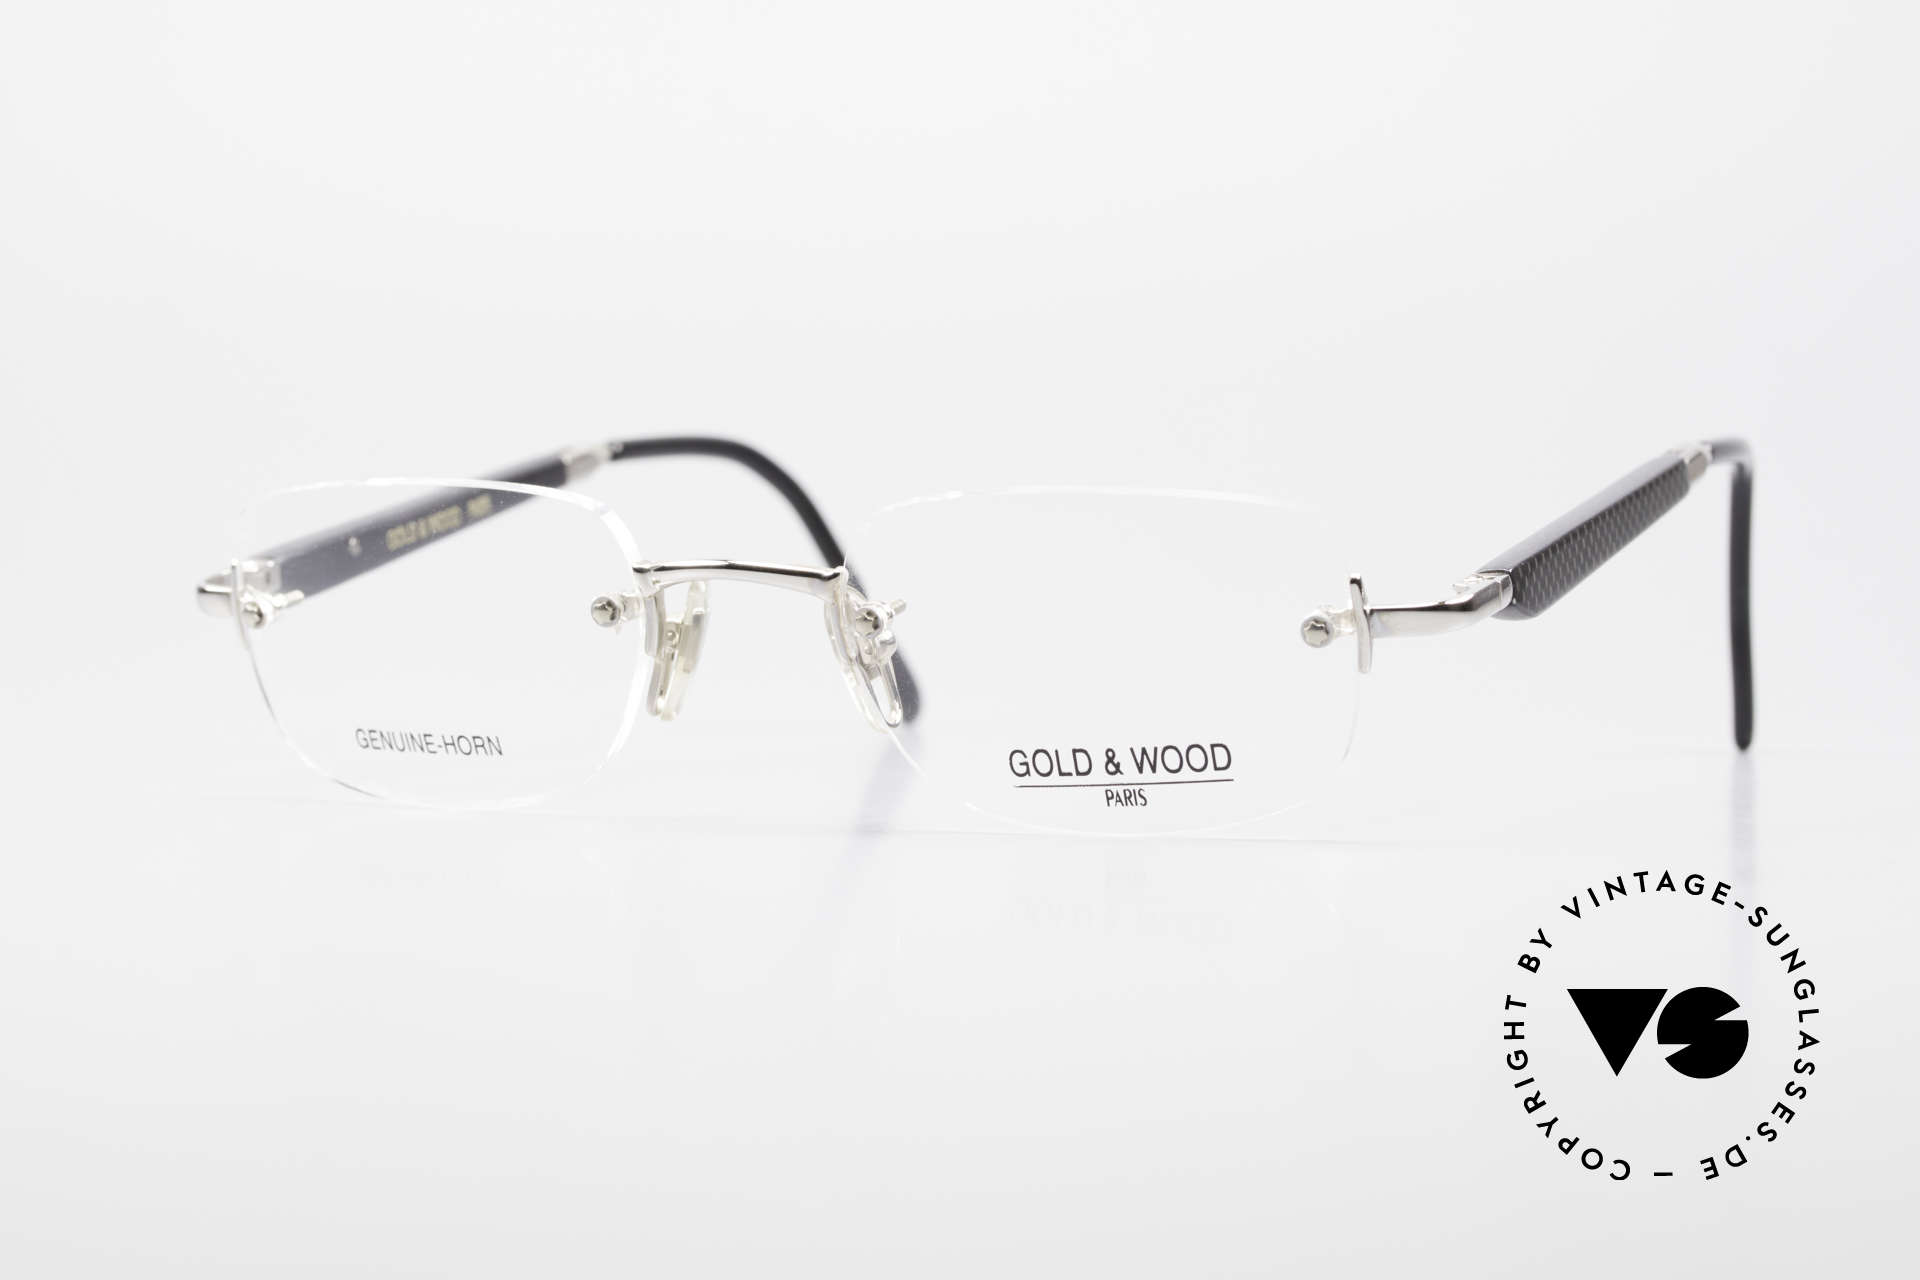 Gold & Wood 332 Genuine Horn Rimless Glasses, Gold & Wood Paris glasses, 332-16, genuine horn, Made for Men and Women